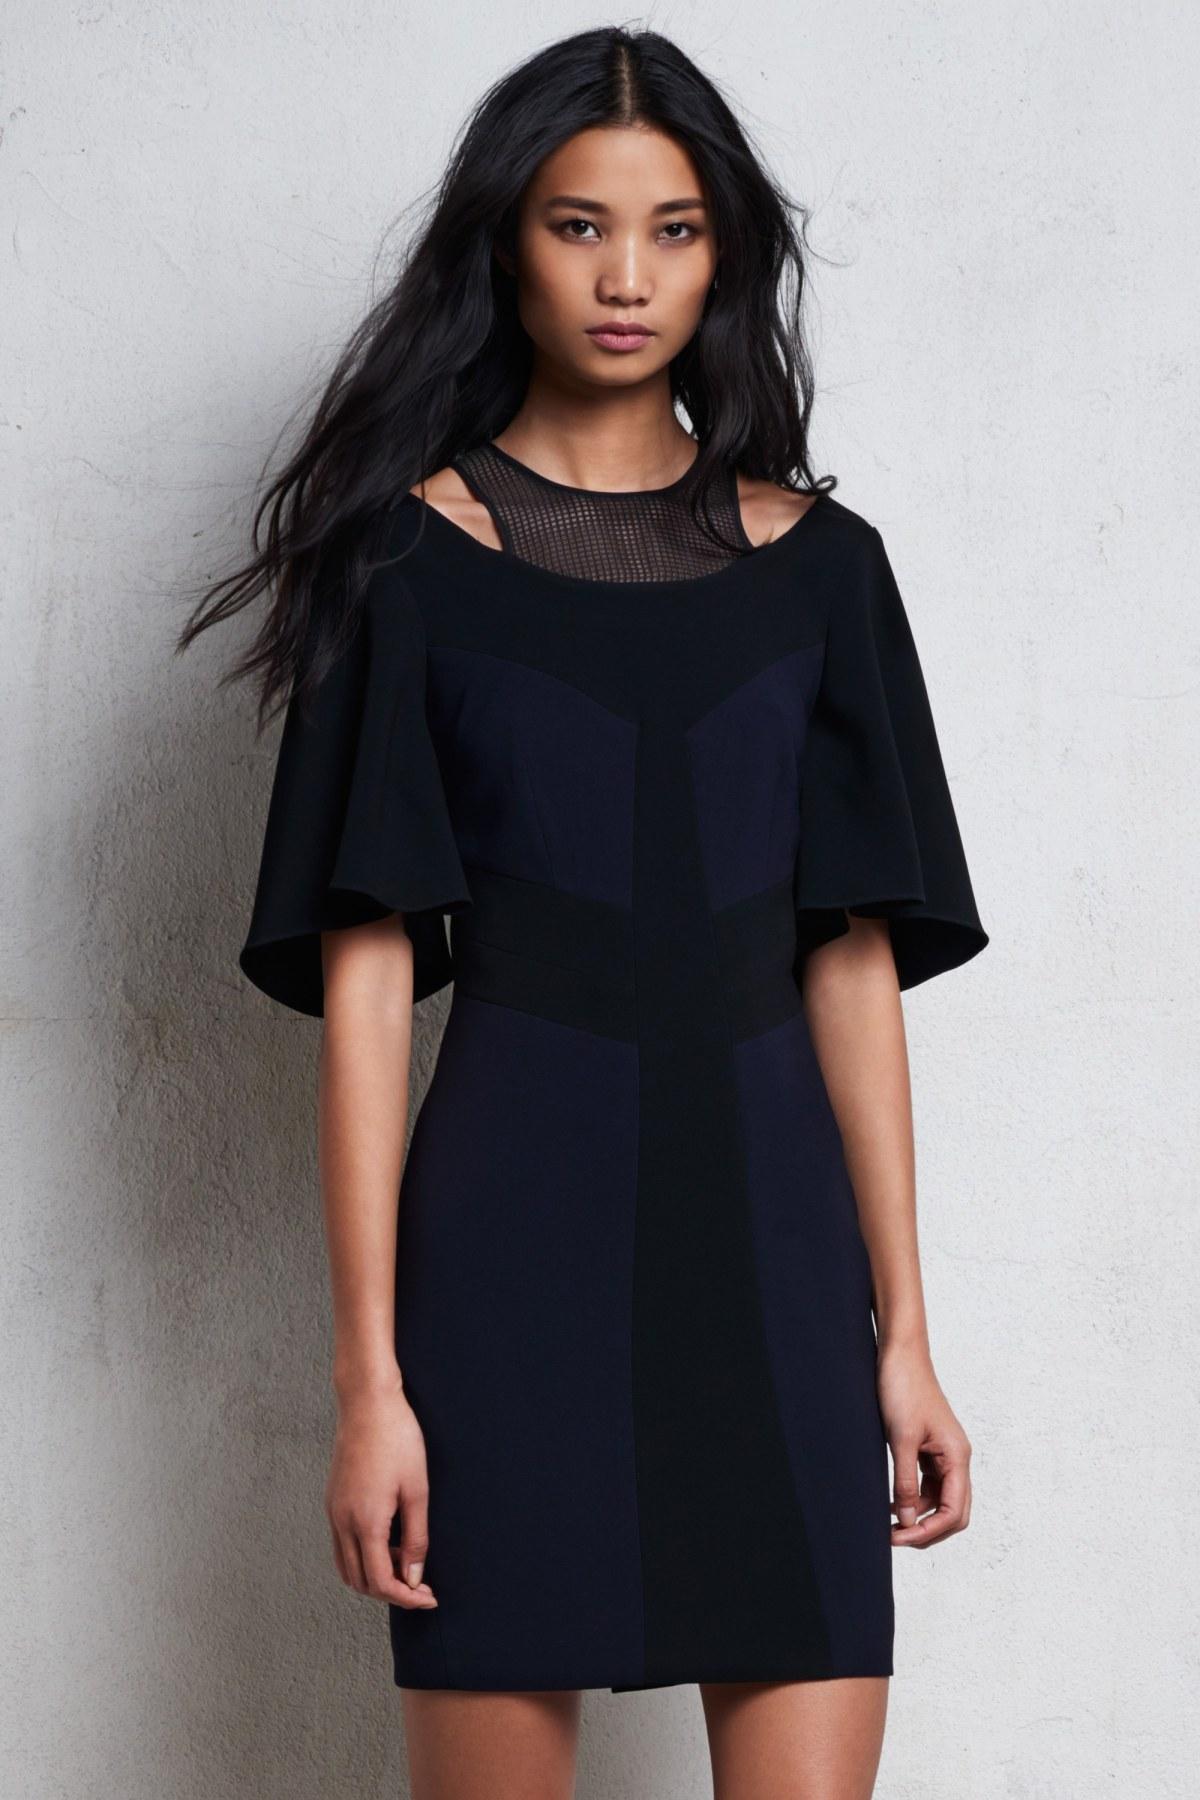 kimora-lee-simmons-pre-fall-2017-fashion-show-the-impression-10